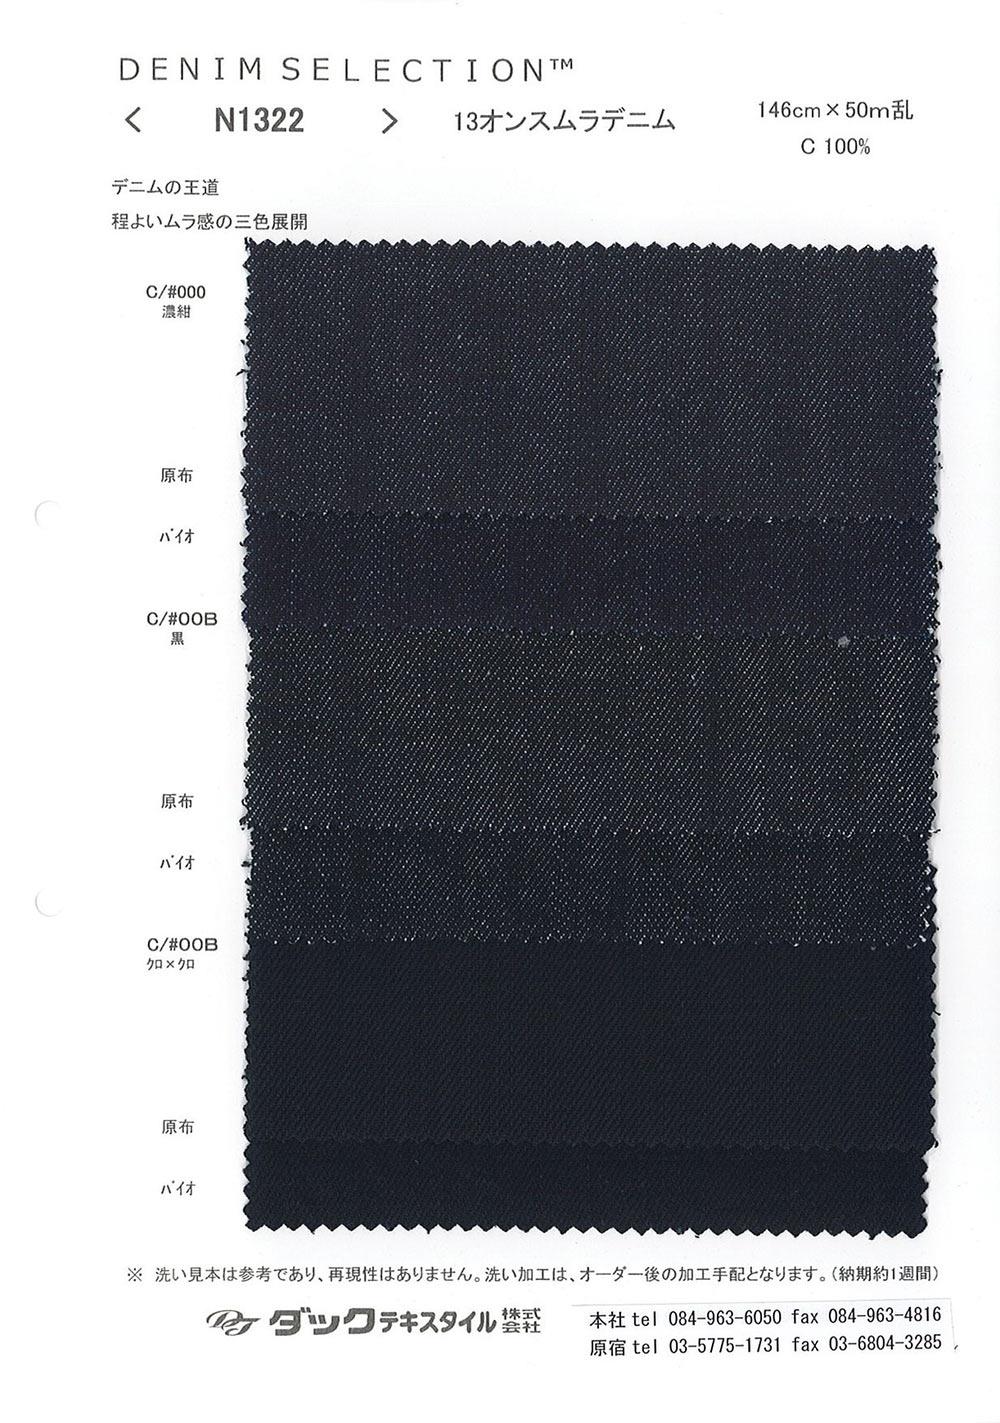 N1322 13オンスムラデニム[生地] ダックテキスタイル/オークラ商事 - ApparelX アパレル資材卸通販